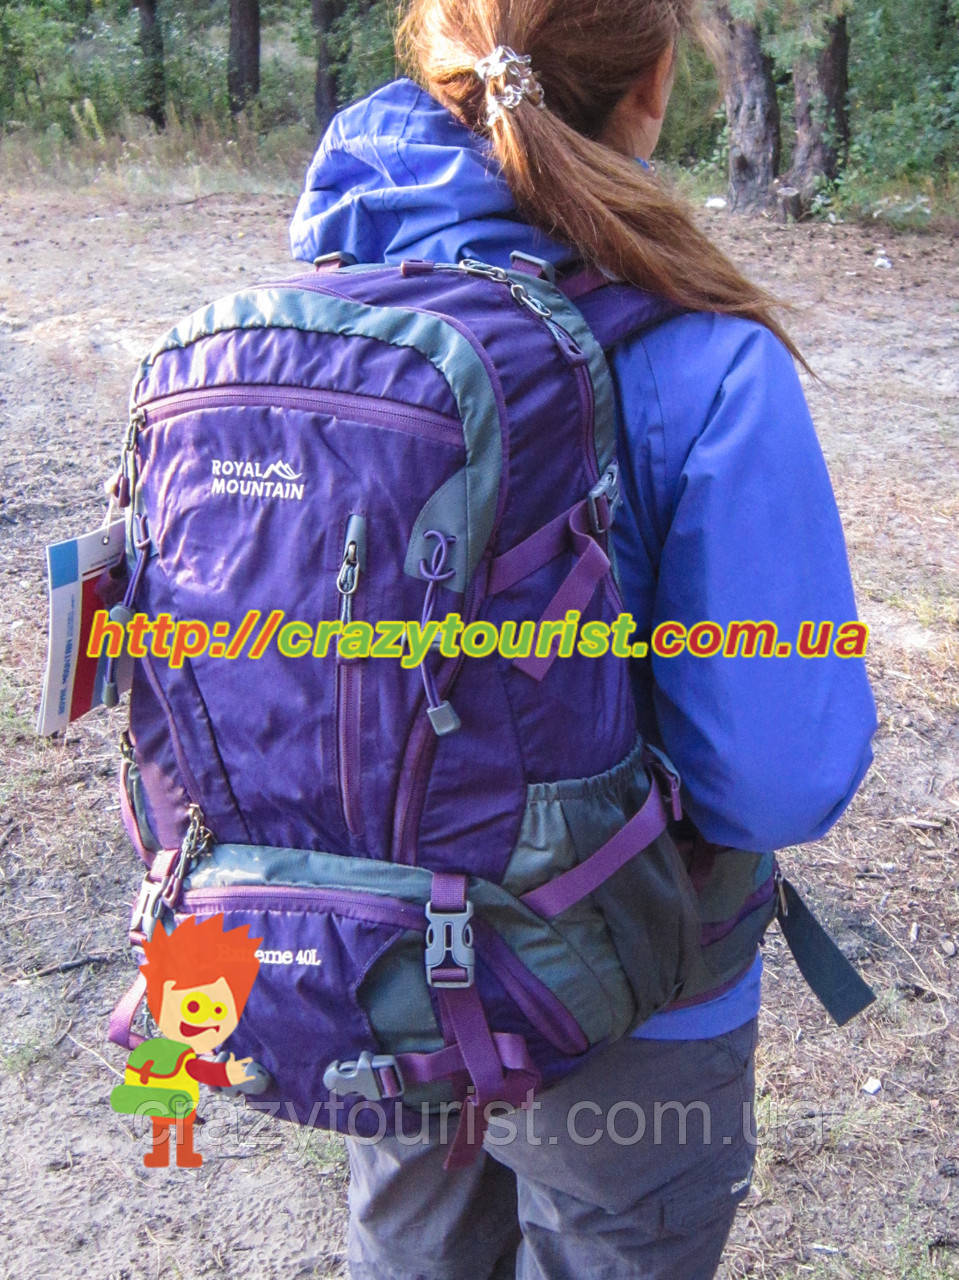 Рюкзак Royal Mountain 8421 40 L Purple - Crazy Tourist в Каменском